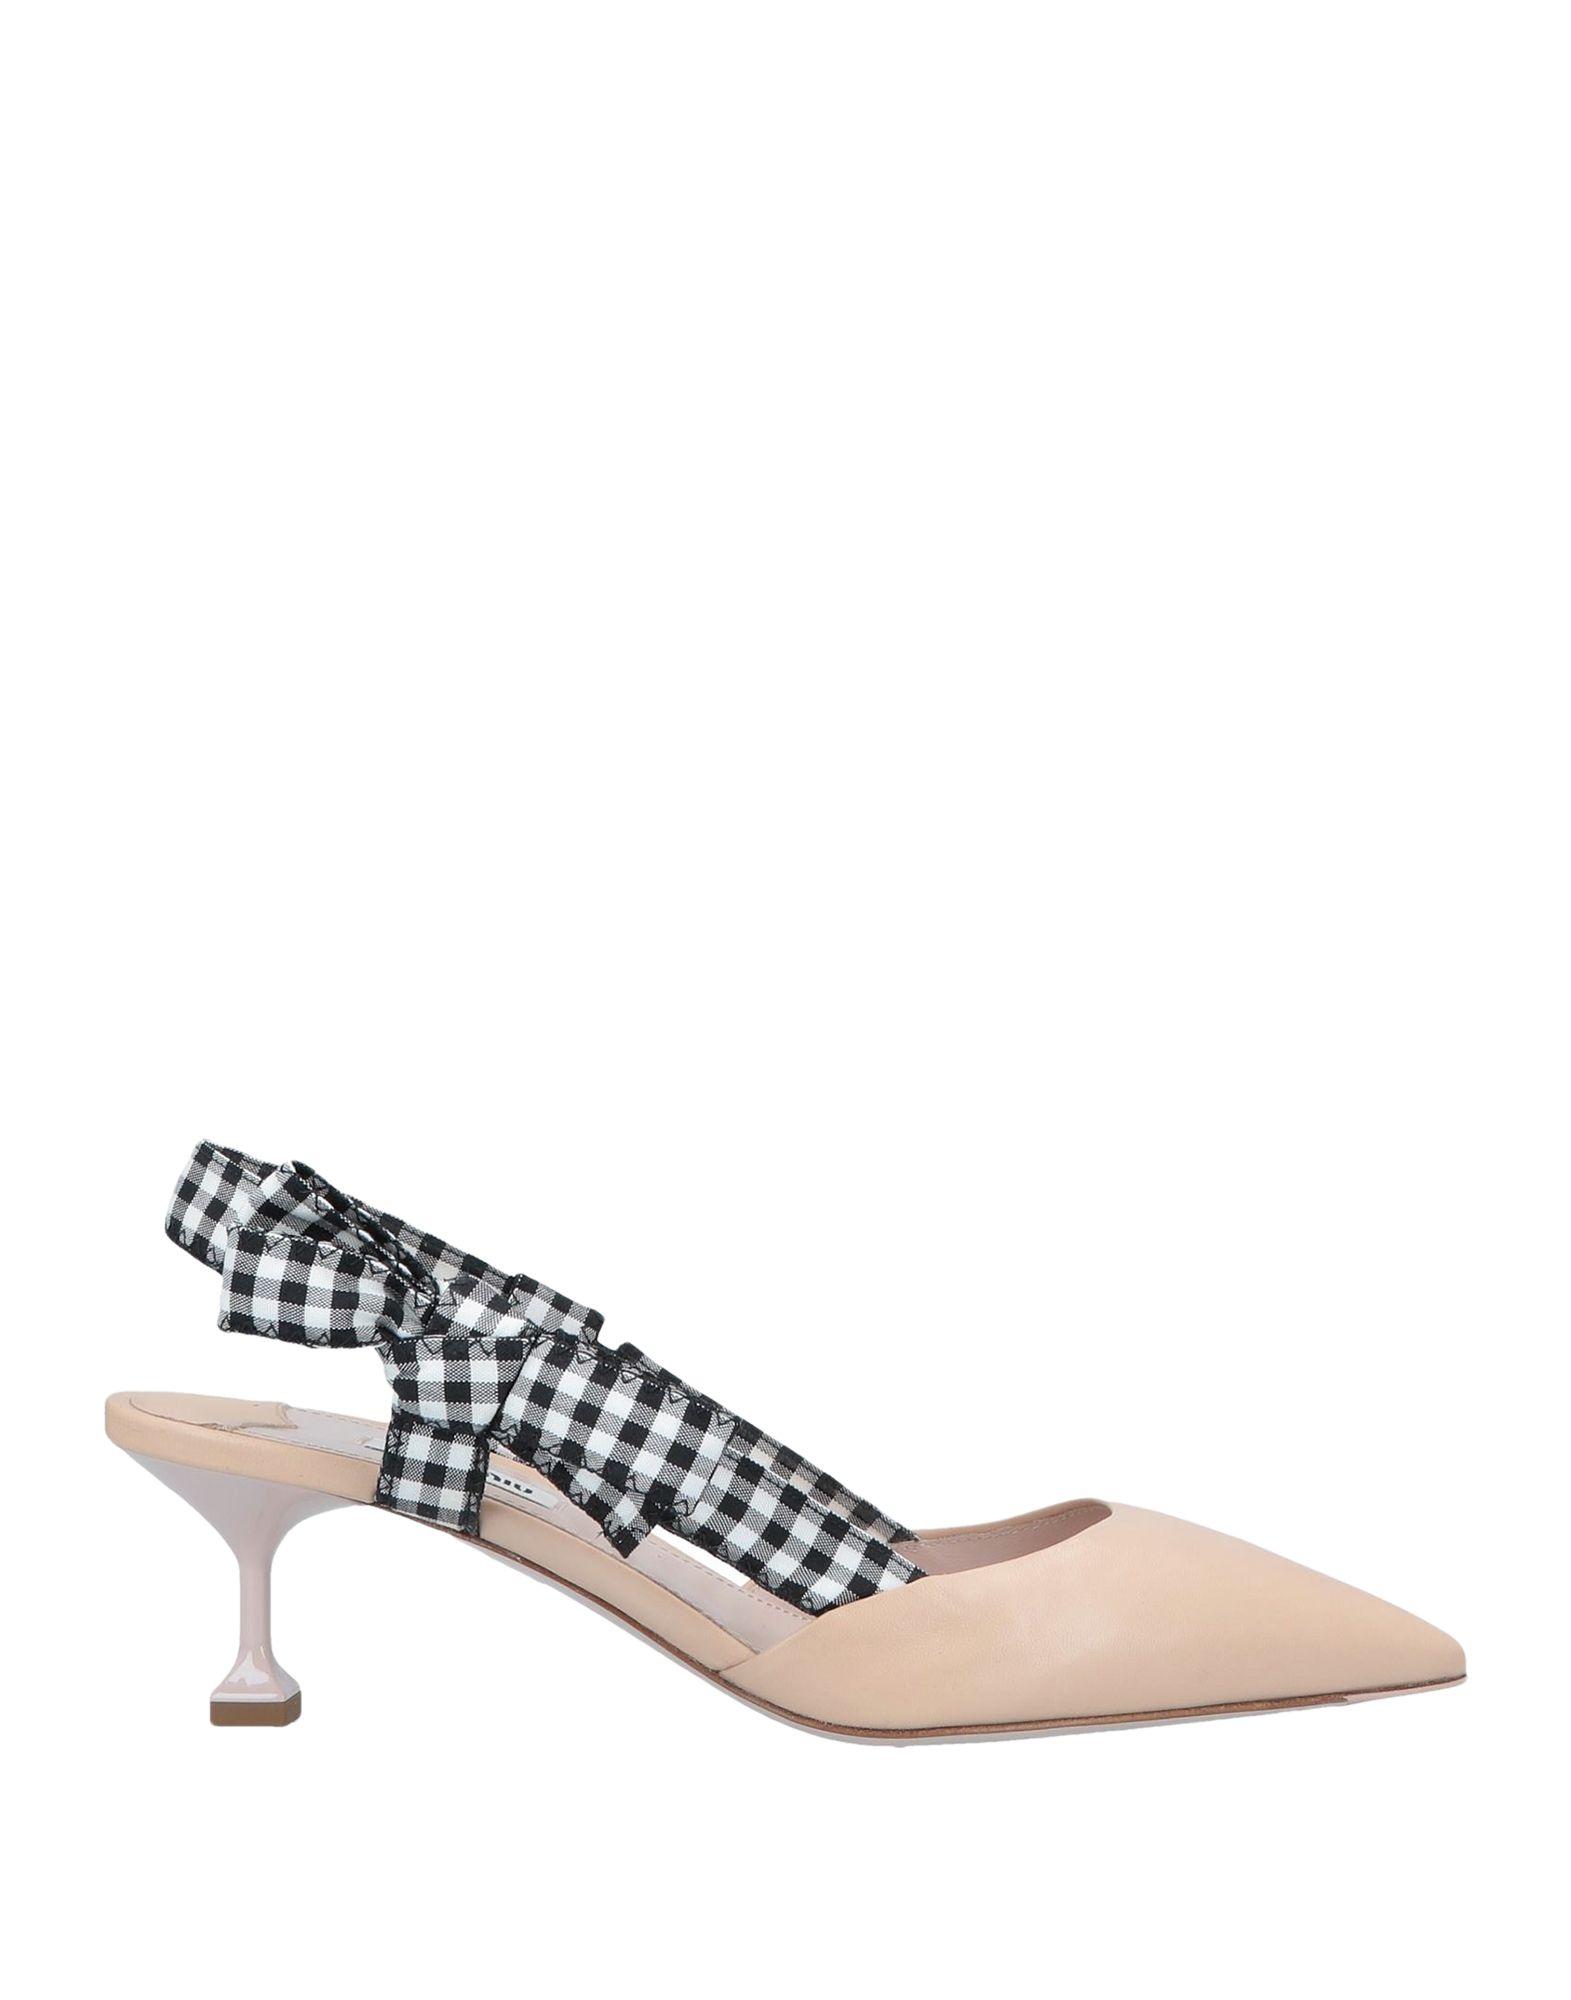 Décolleté donna online  scarpe décolleté con tacco alto e basso  617734956e1